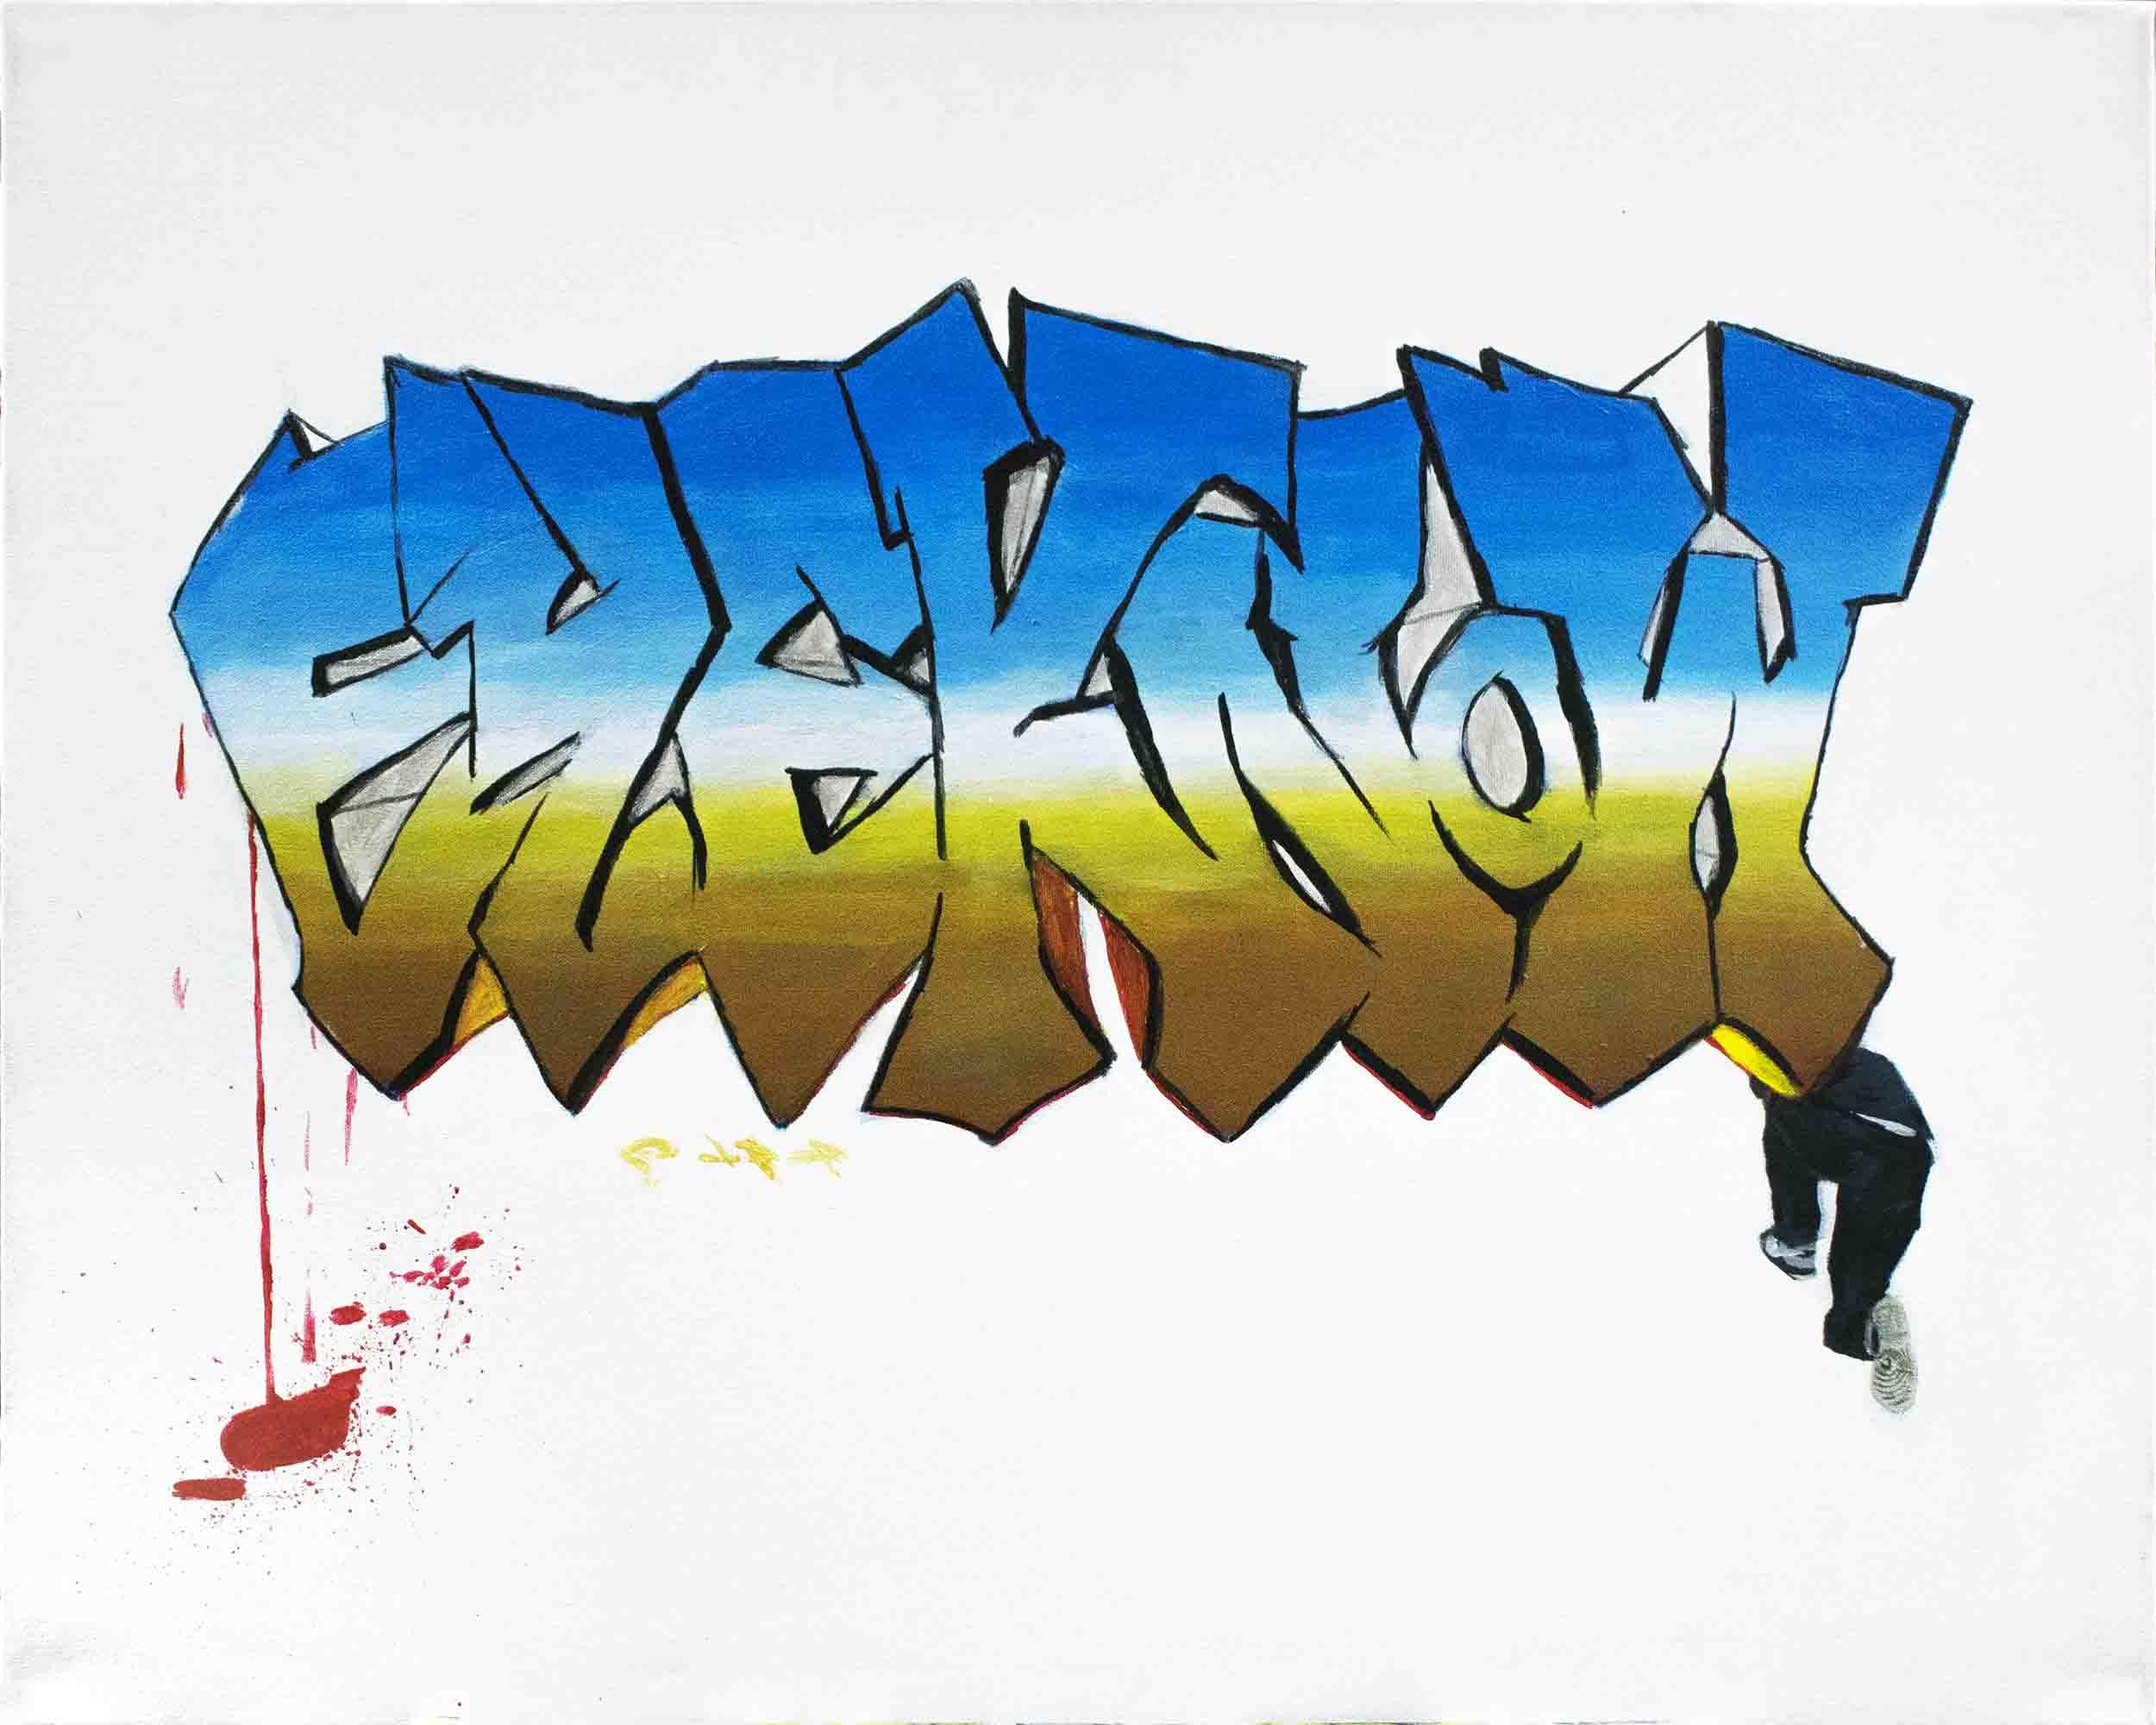 Super-Saturated pseudo-Graffiti - back